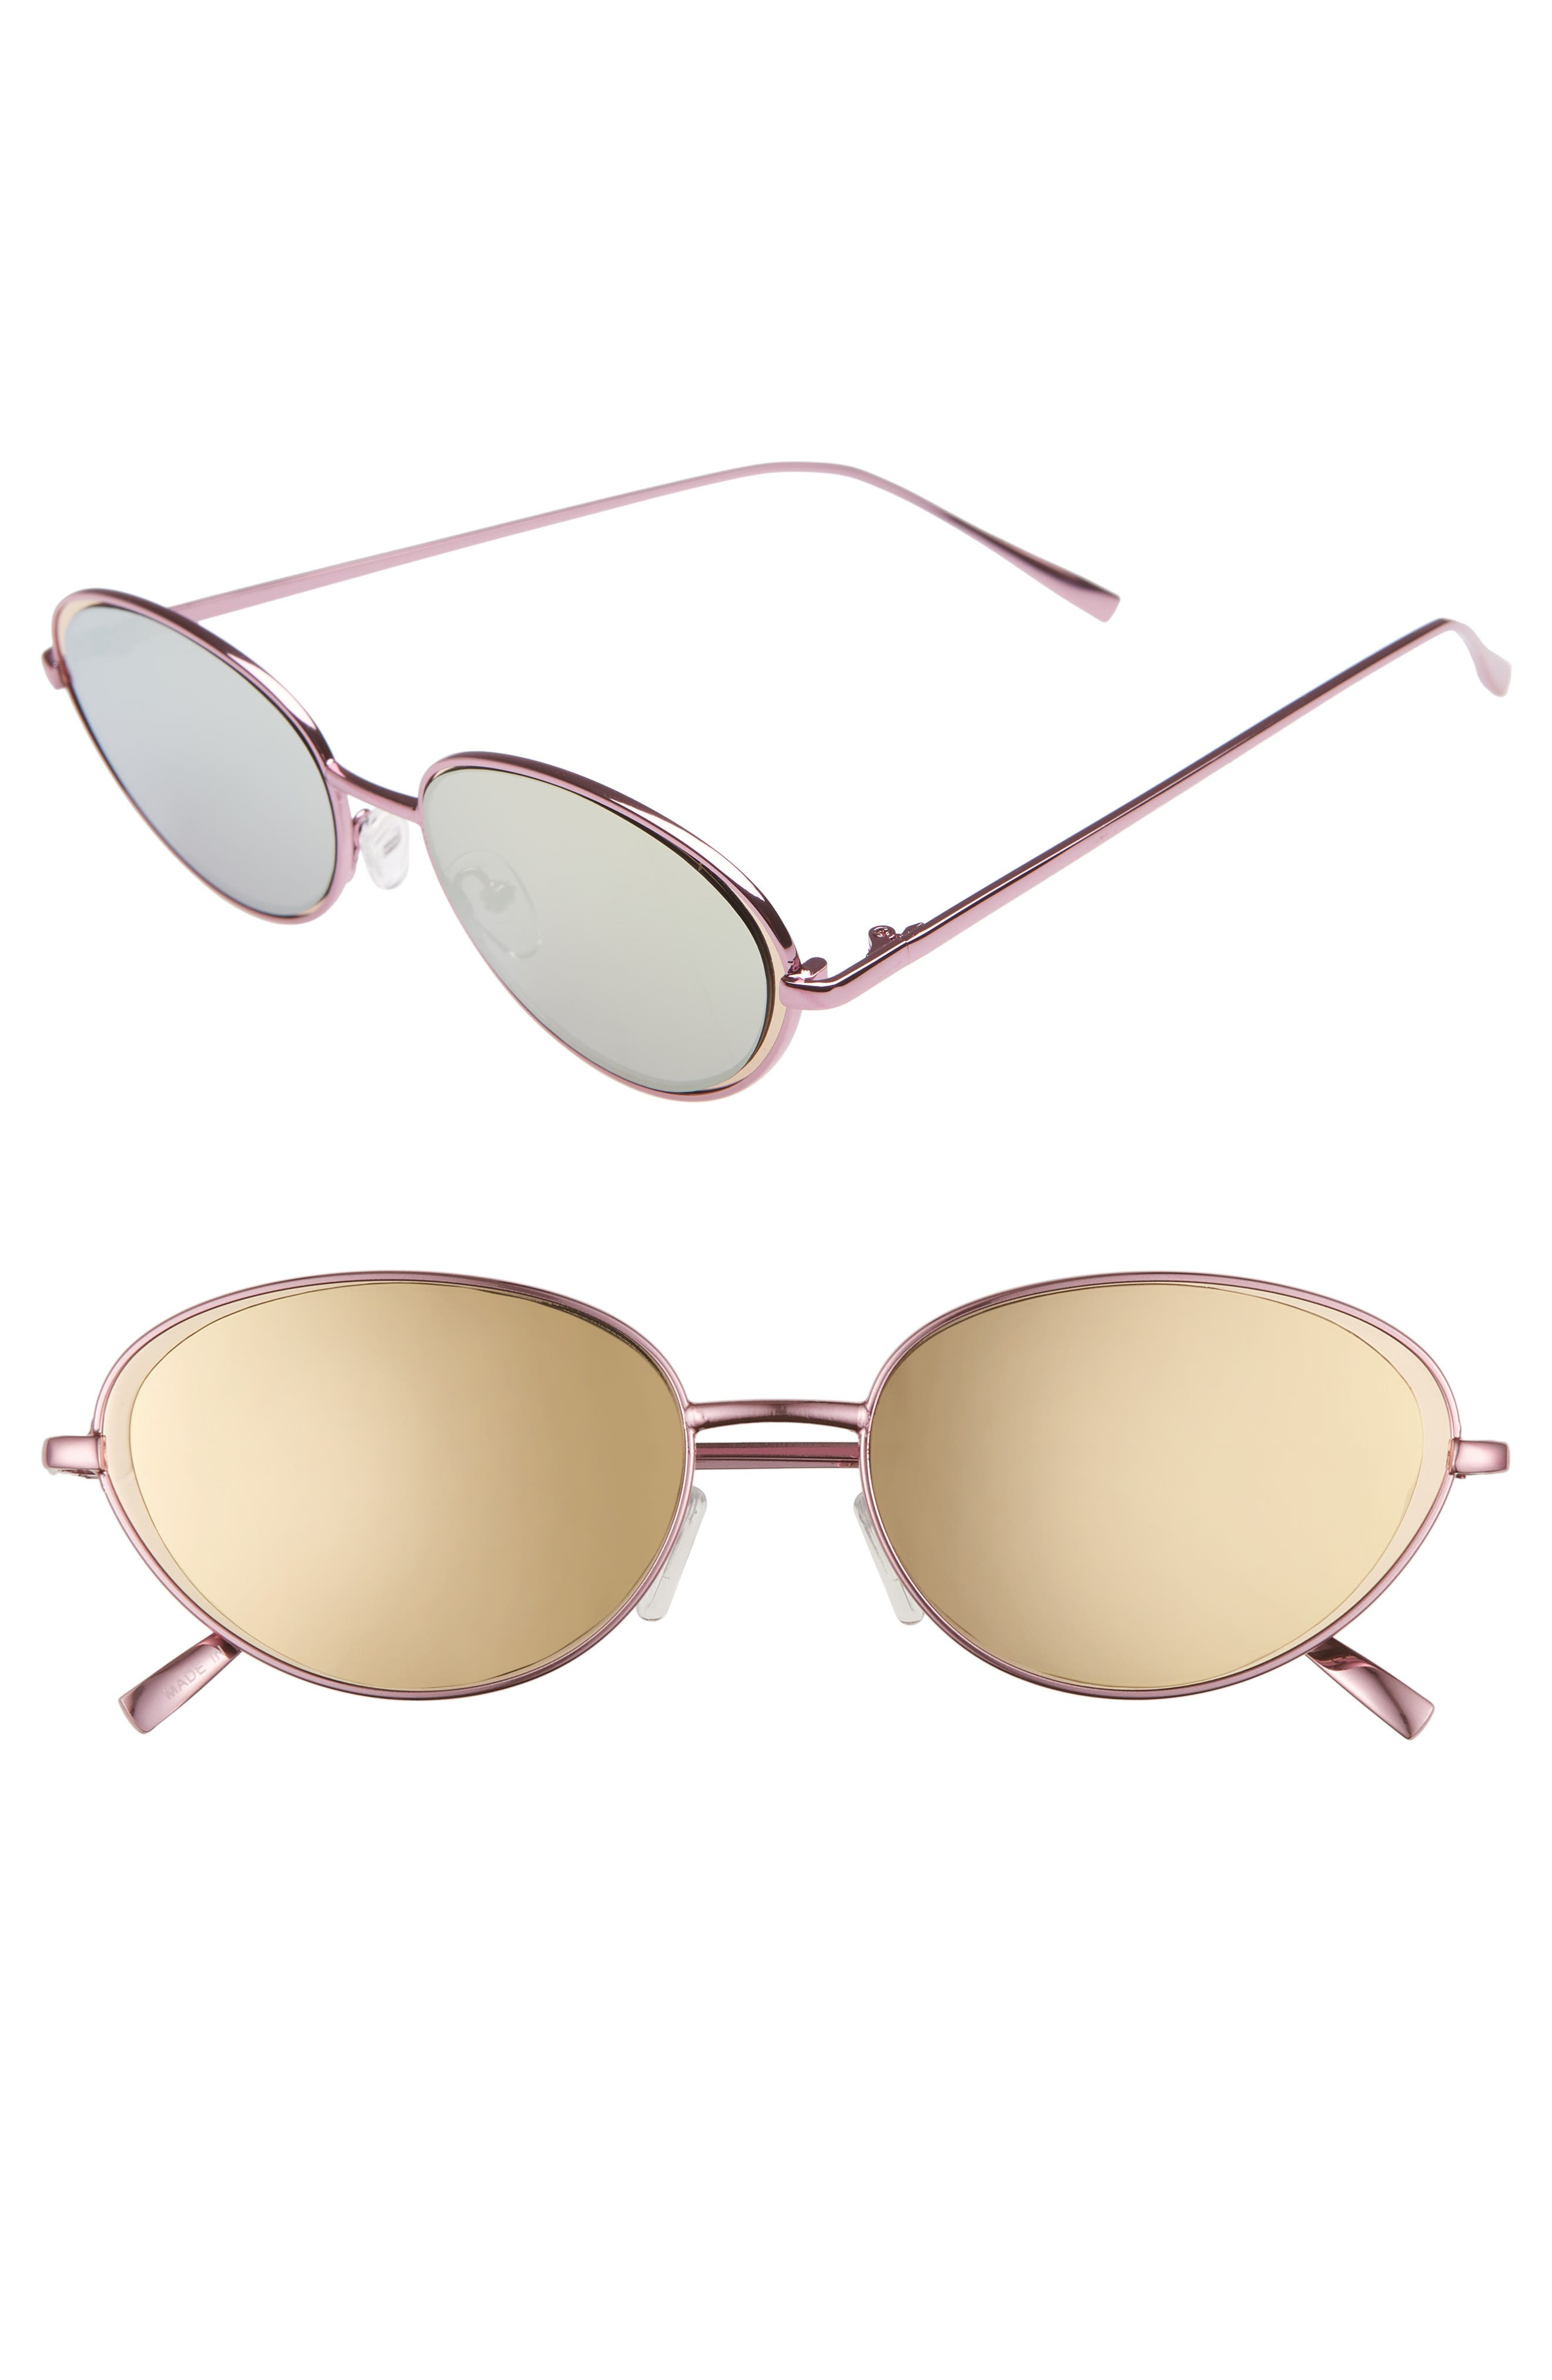 57mm Oval Sunglasses,                             Main thumbnail 1, color,                             650